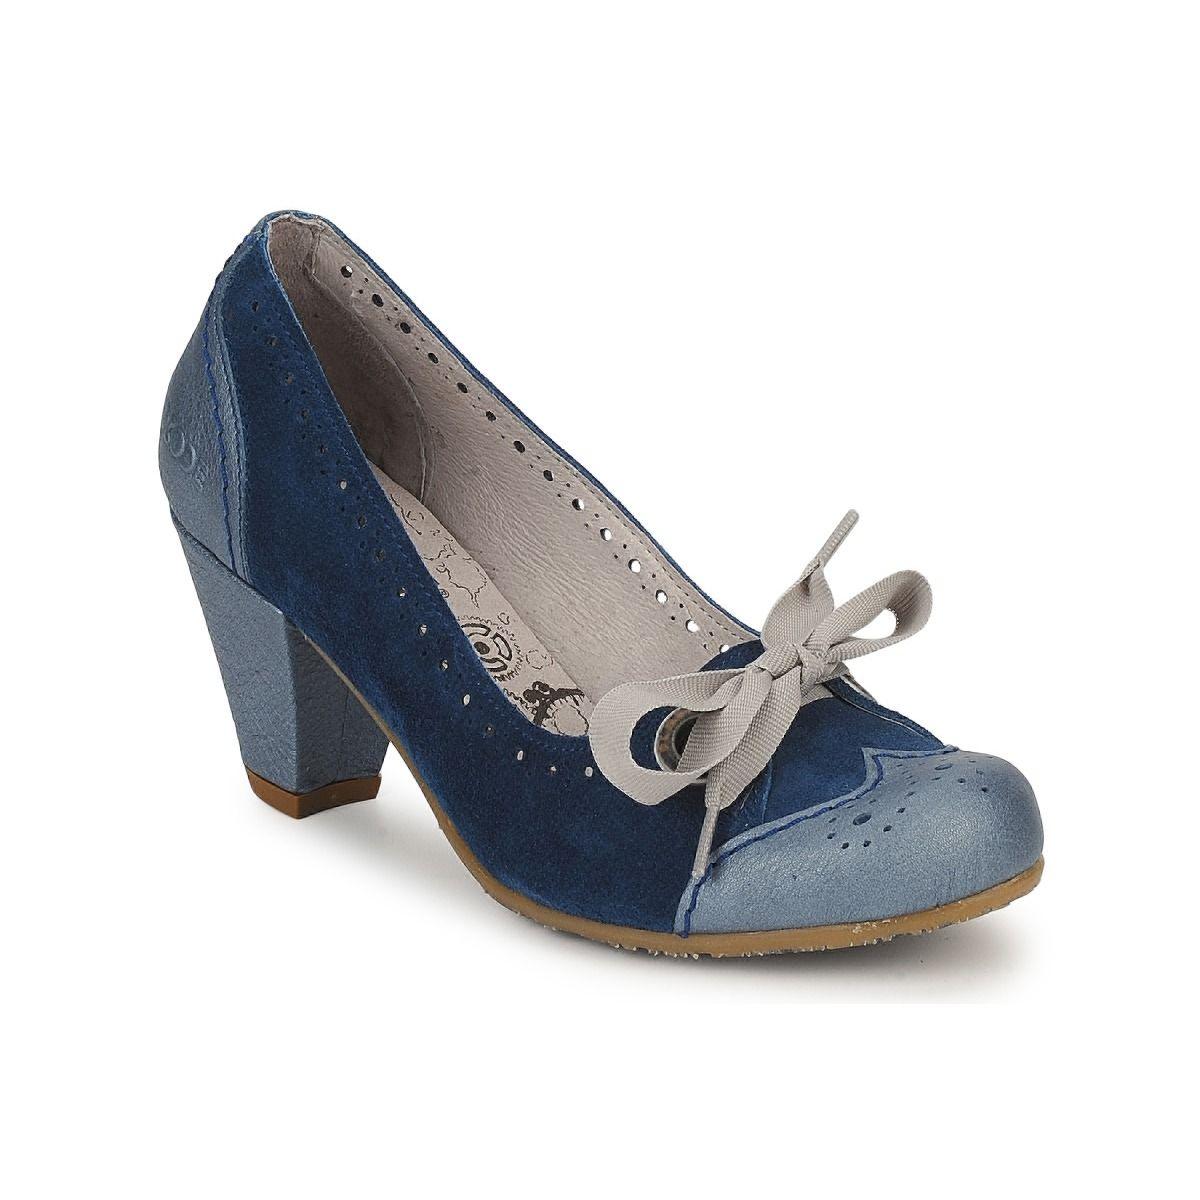 5dbfb0c31f50 Escarpins Dkode OASIS Bleu - Livraison Gratuite avec Spartoo.com ! - Chaussures  Femme 79